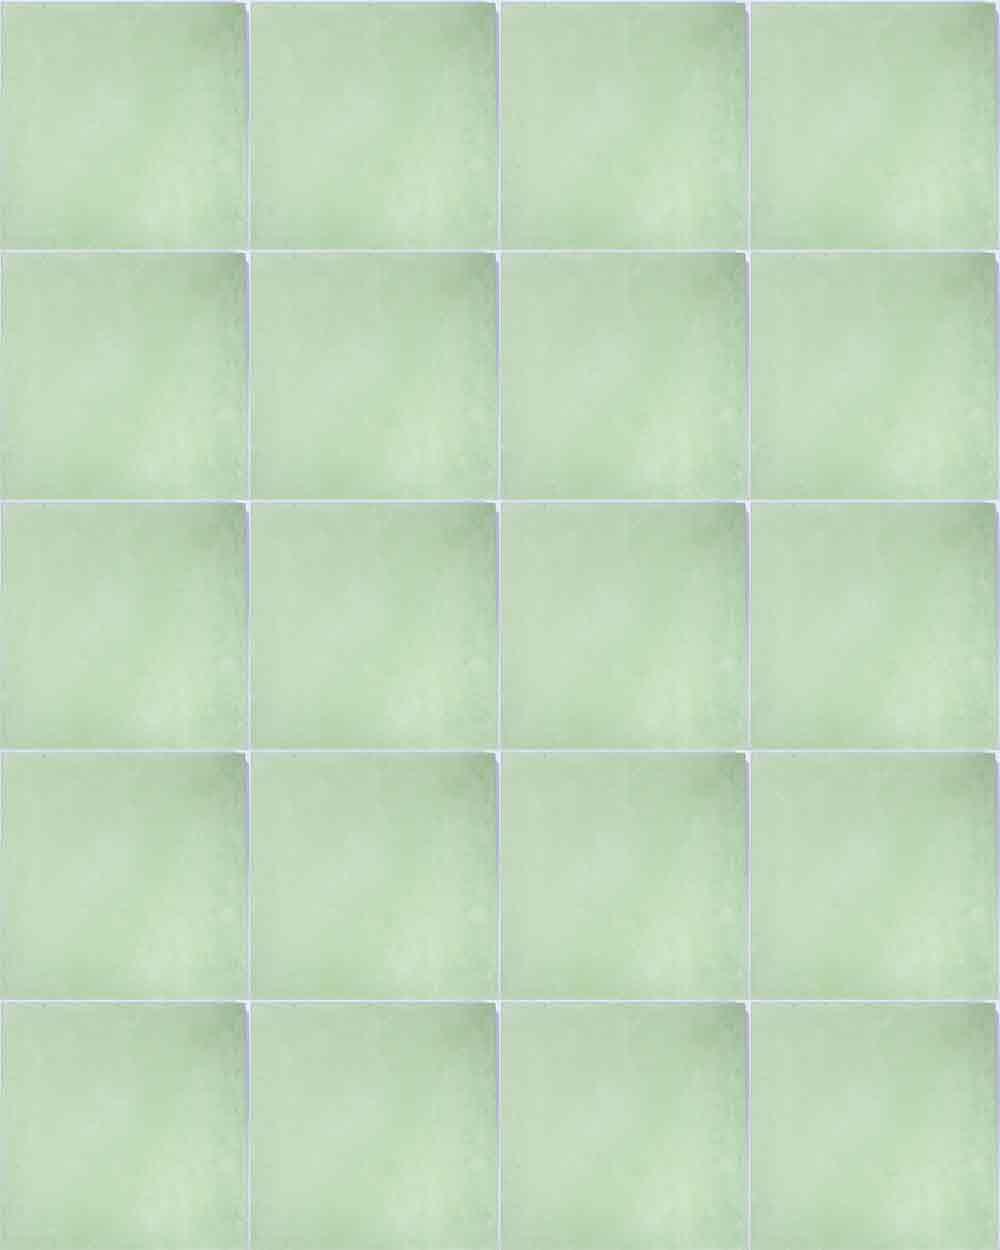 Laurel green encaustic tile milagros green hand made encasutic floor tiles dailygadgetfo Images